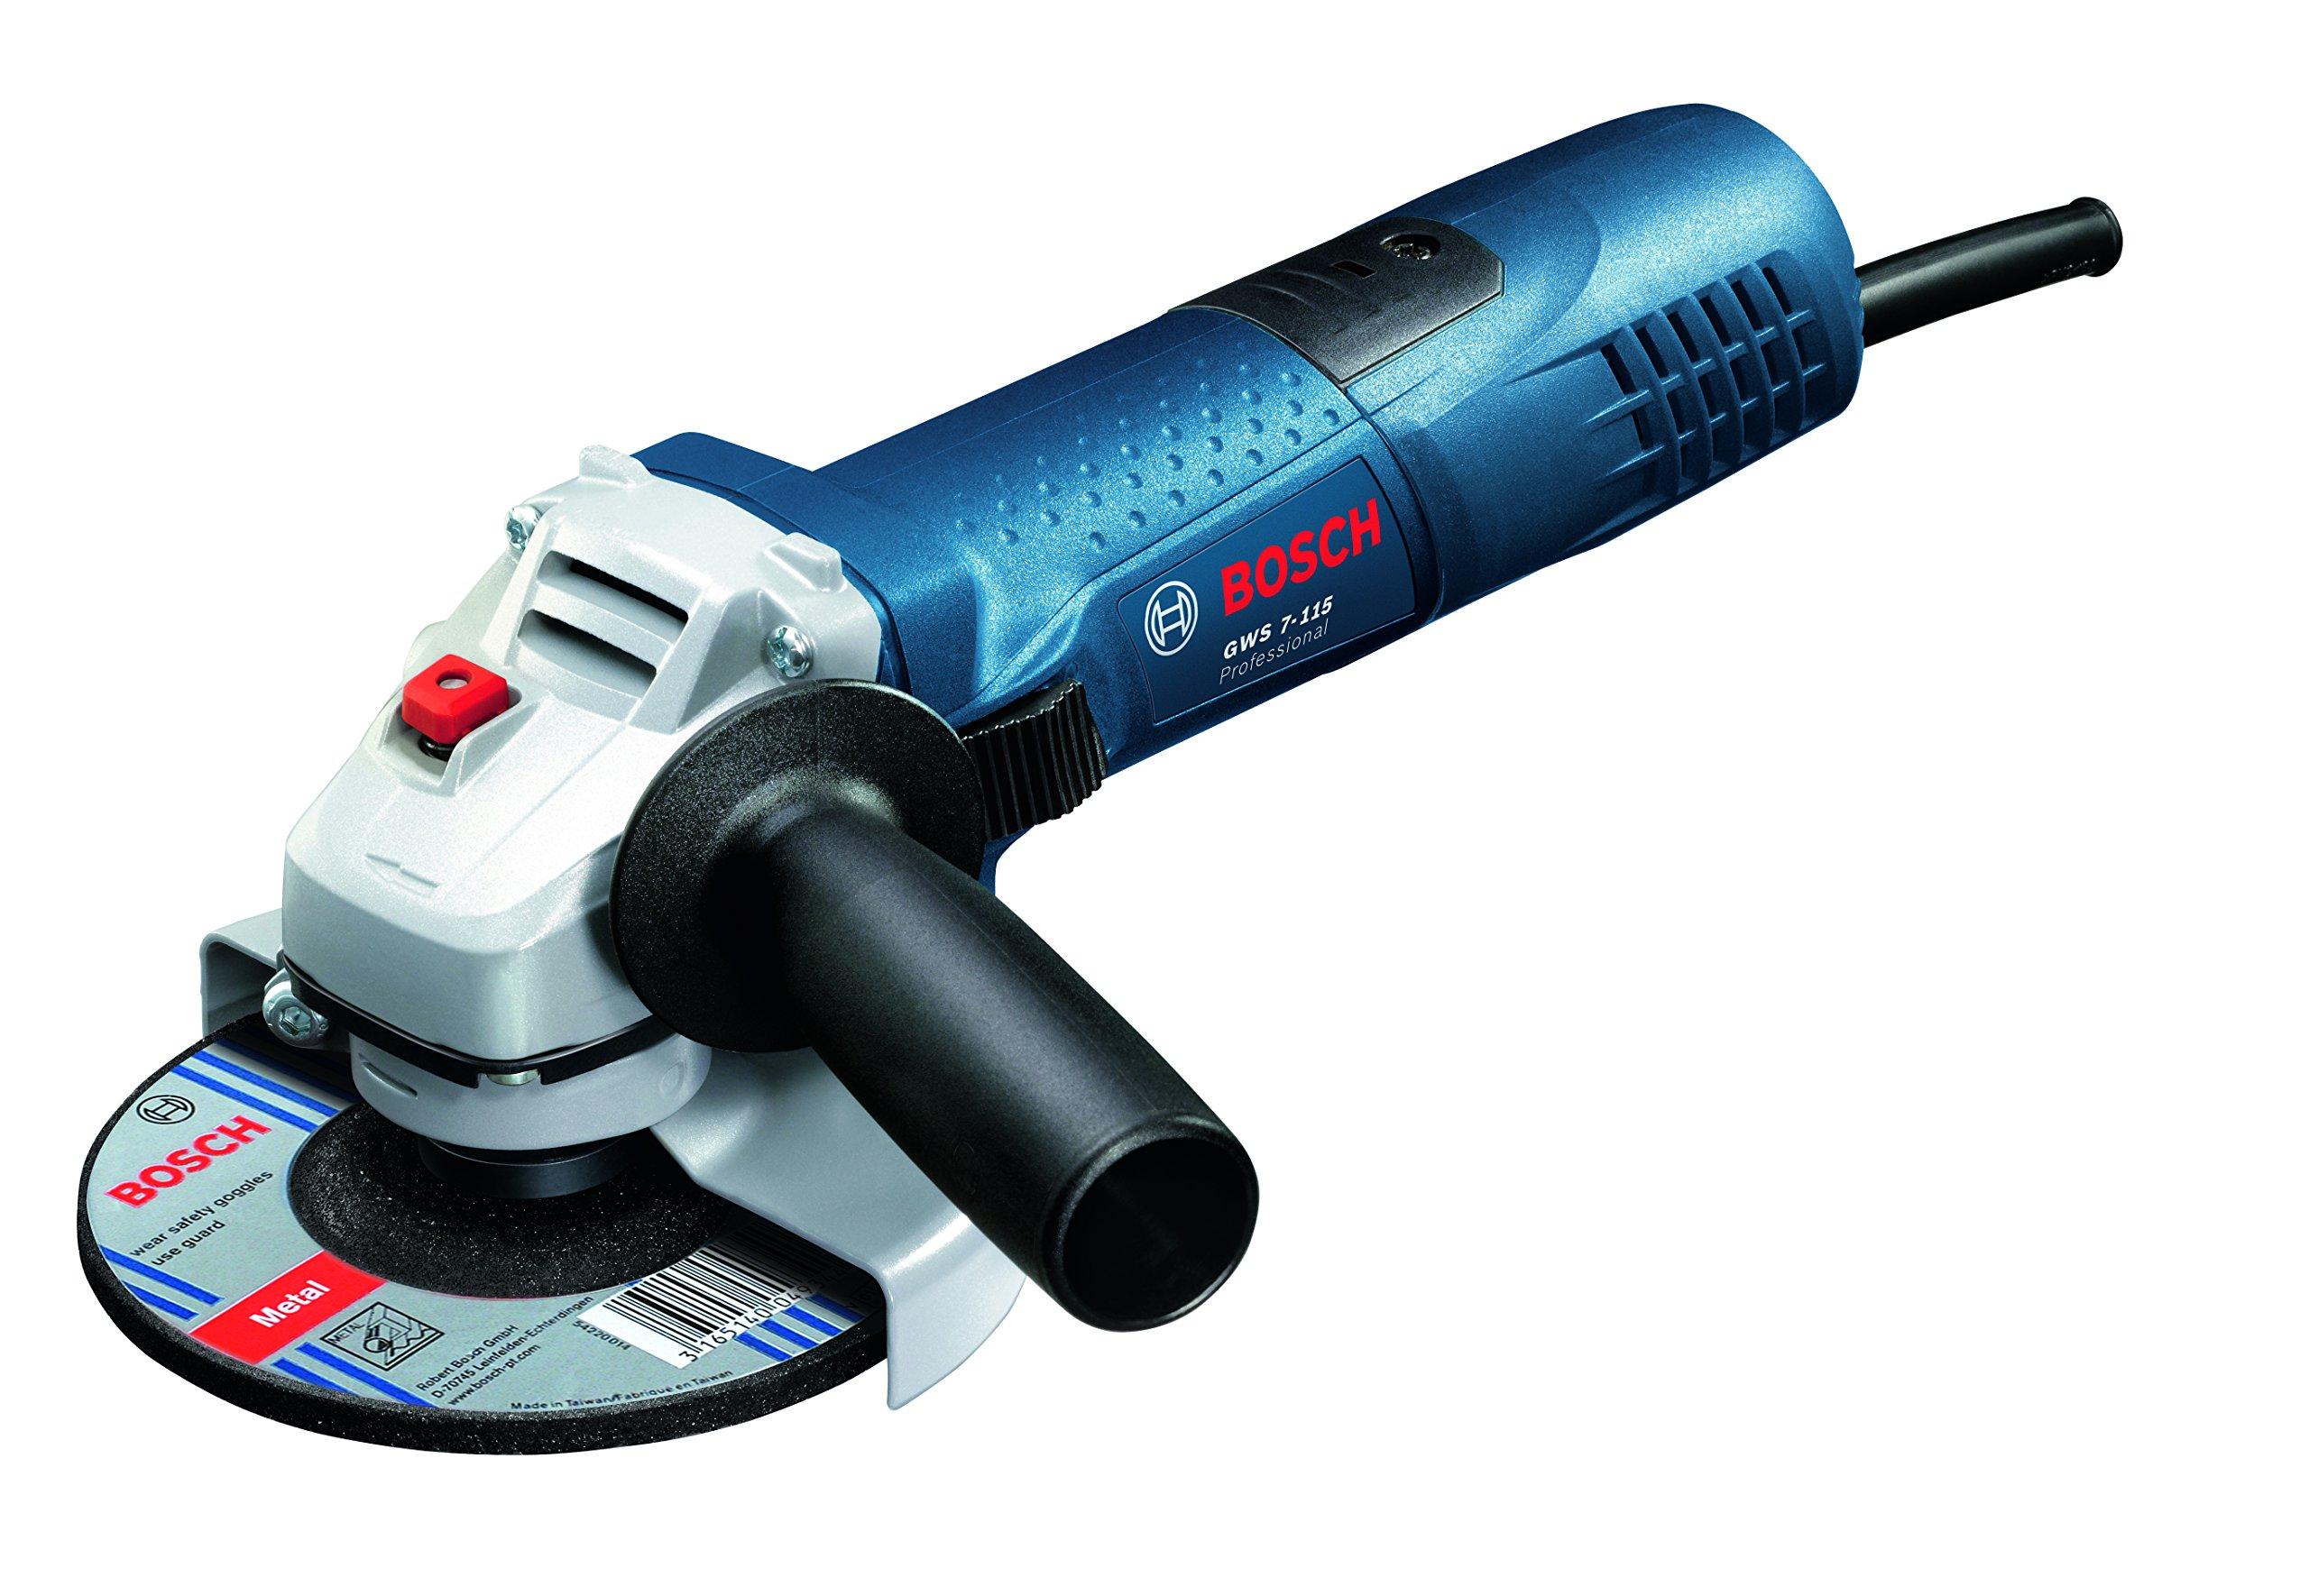 Bosch Professional 0601388106 GWS 7-115 Smerigliatrice Angolare, 720 W, 1.8 kg, 115 mm, Blu, 230 V product image